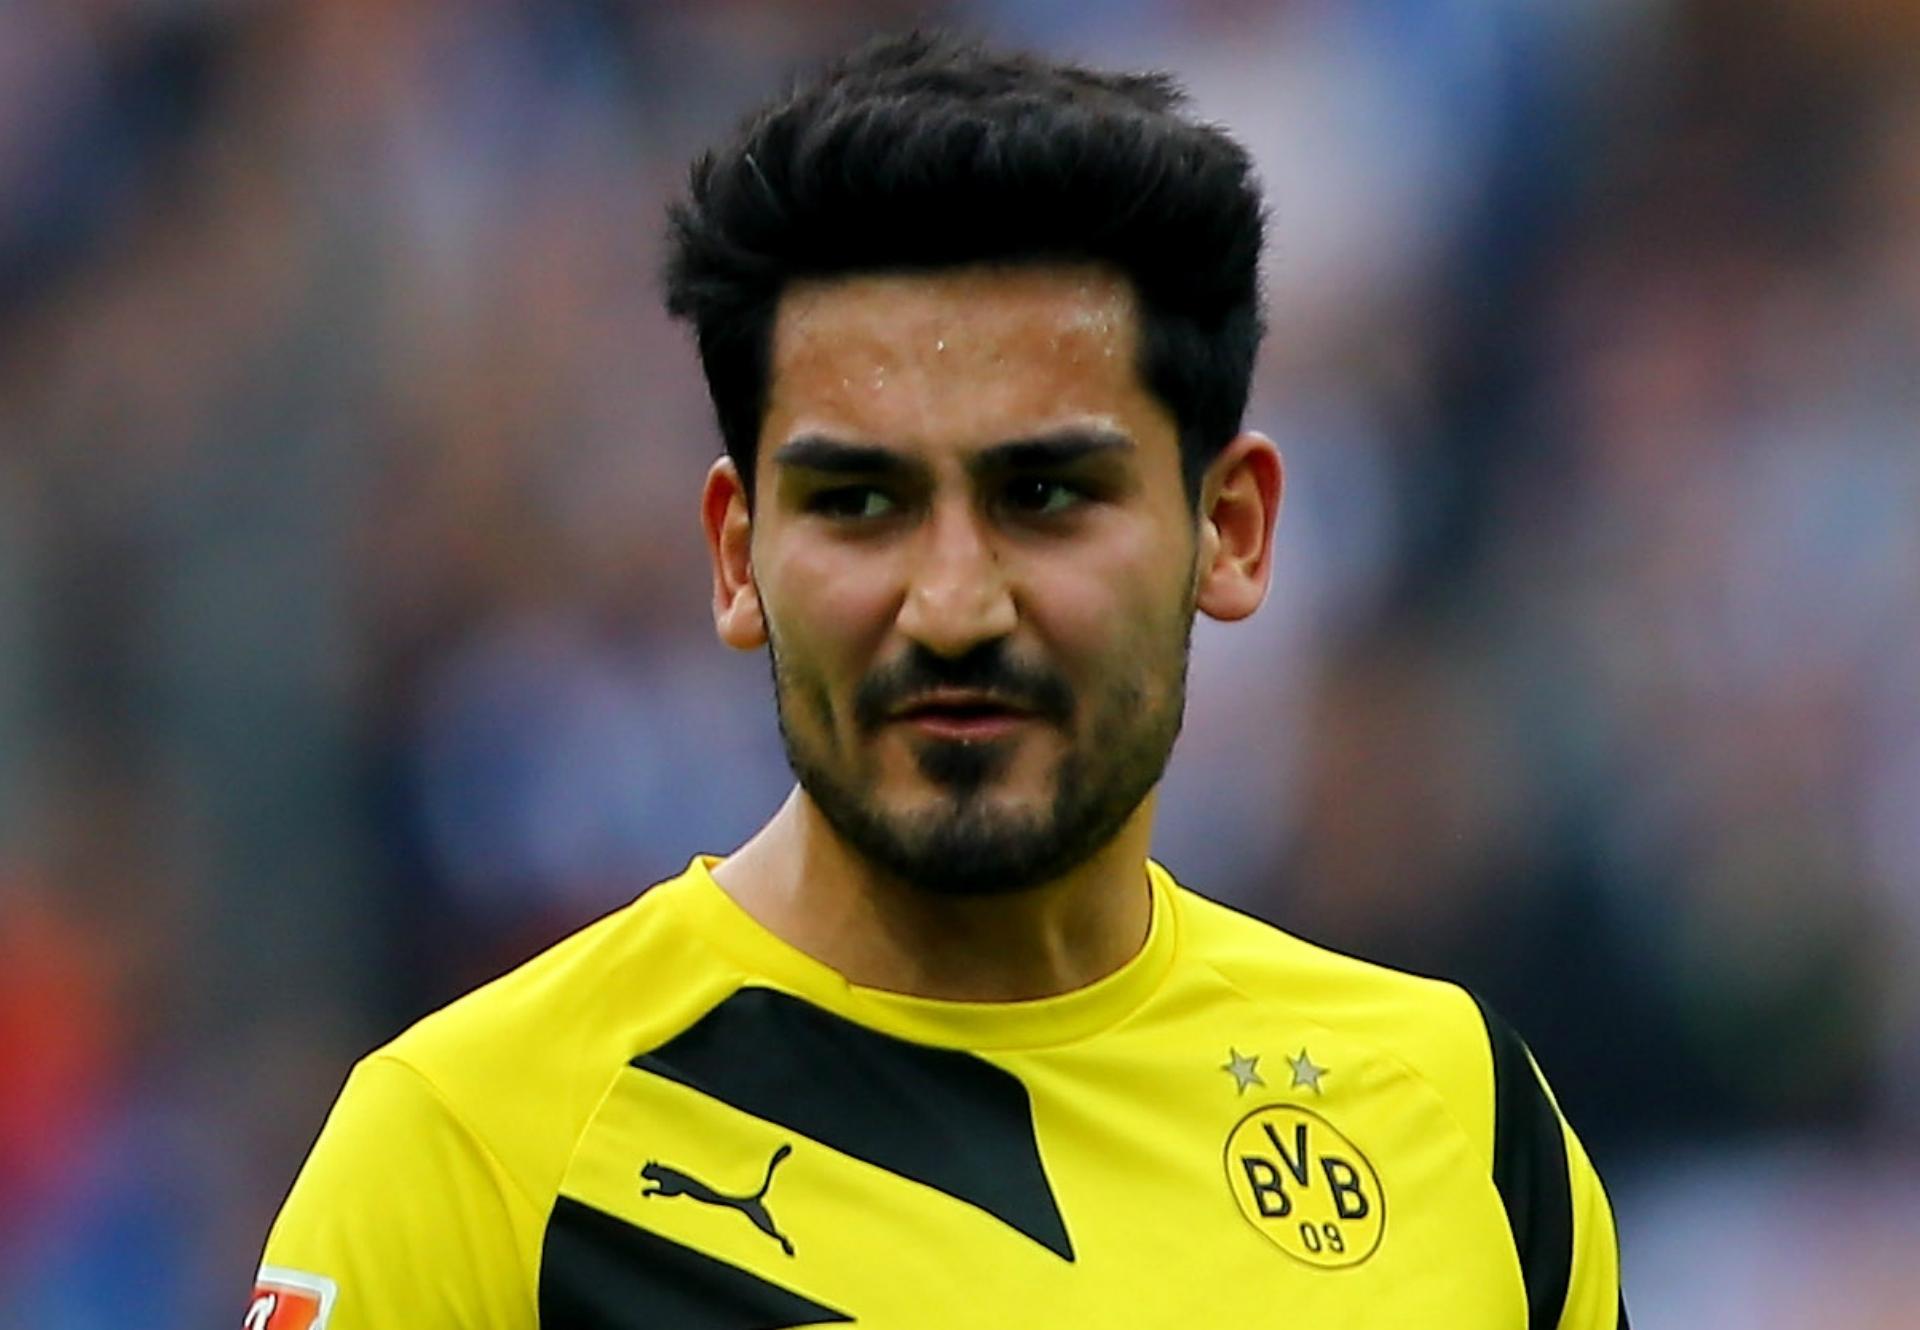 Man City sign Ilkay Gundogan from Borussia Dortmund